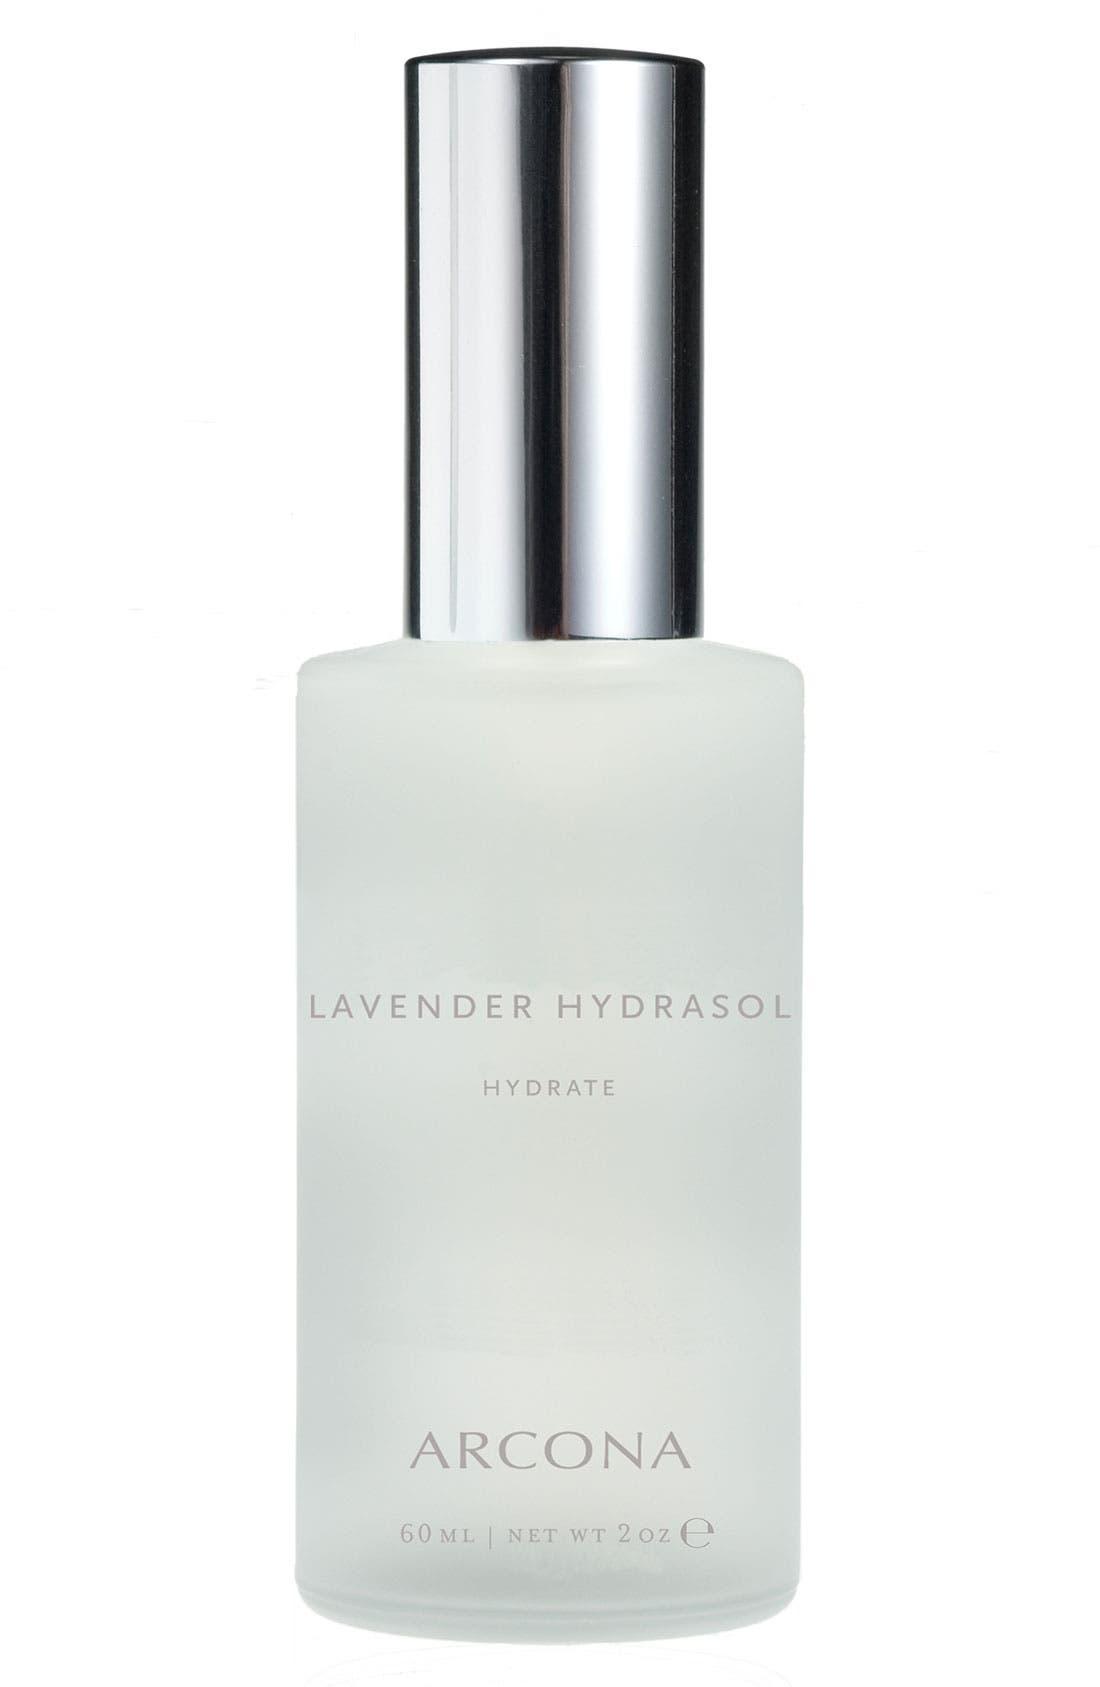 ARCONA 'Lavender' Hydrasol